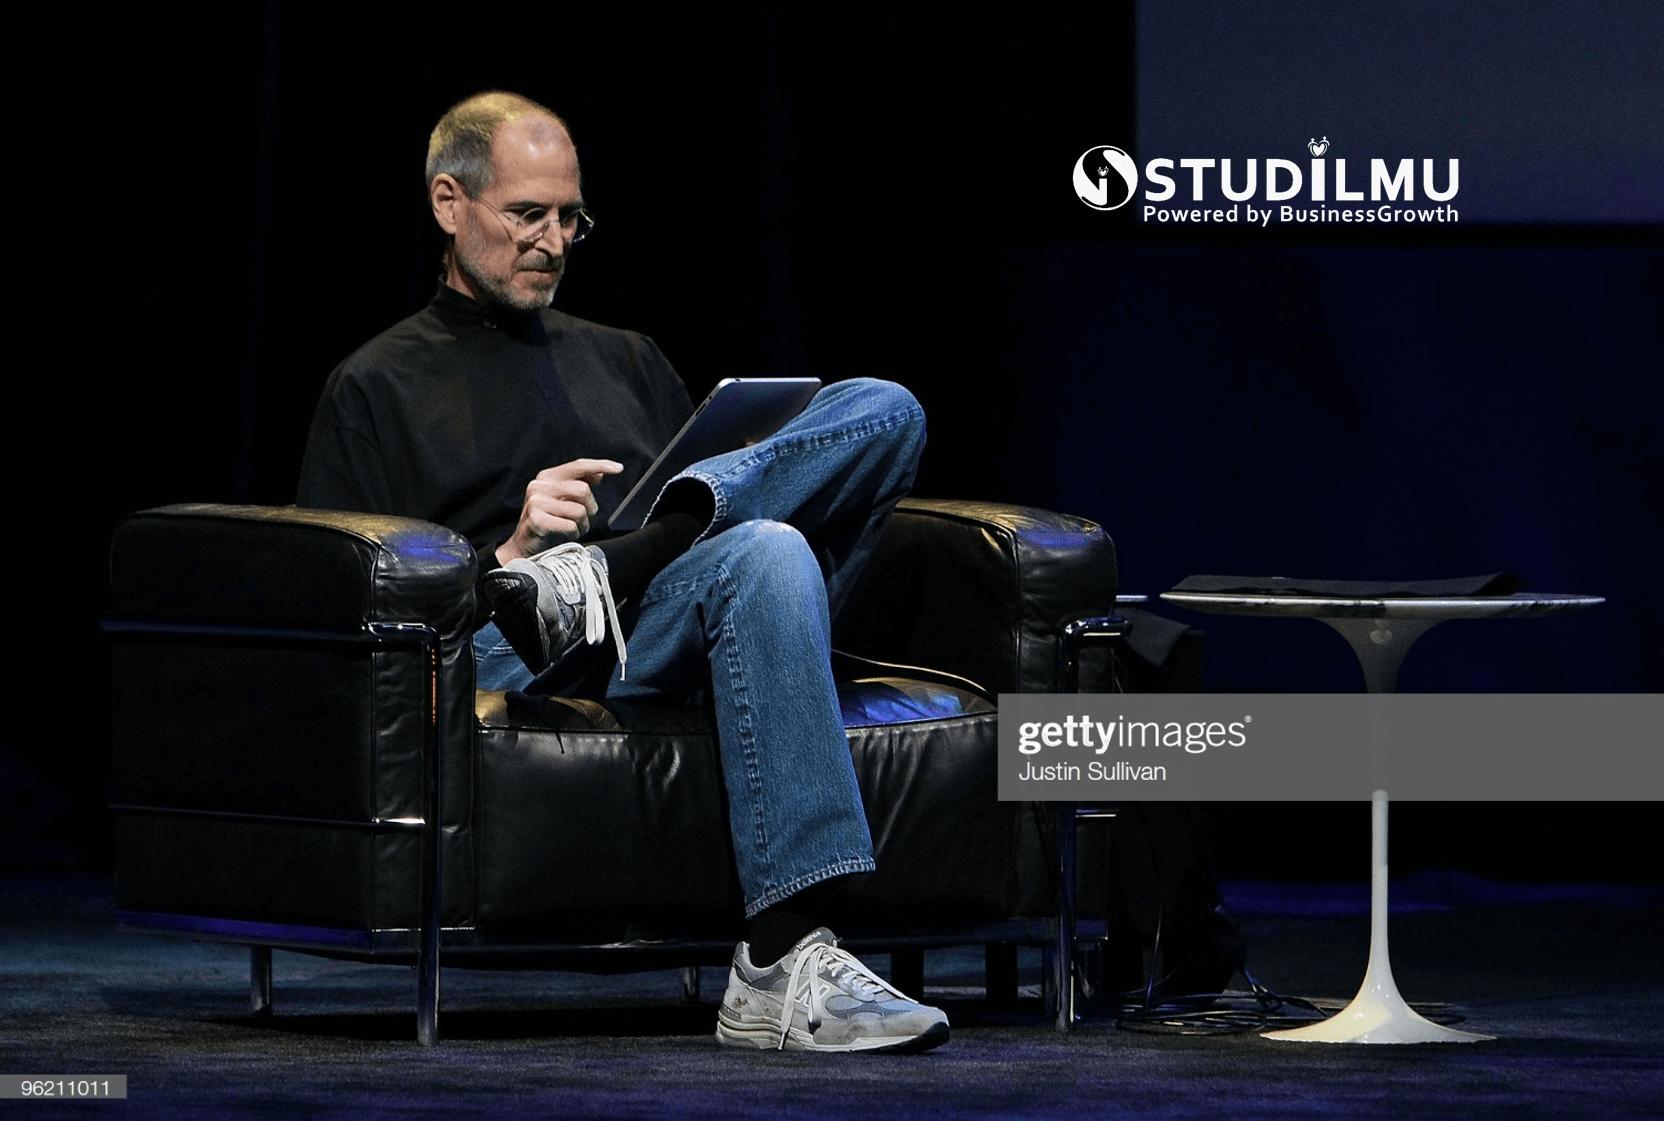 Bagaimana Cara Memiliki Mimpi Besar ala Steve Jobs?